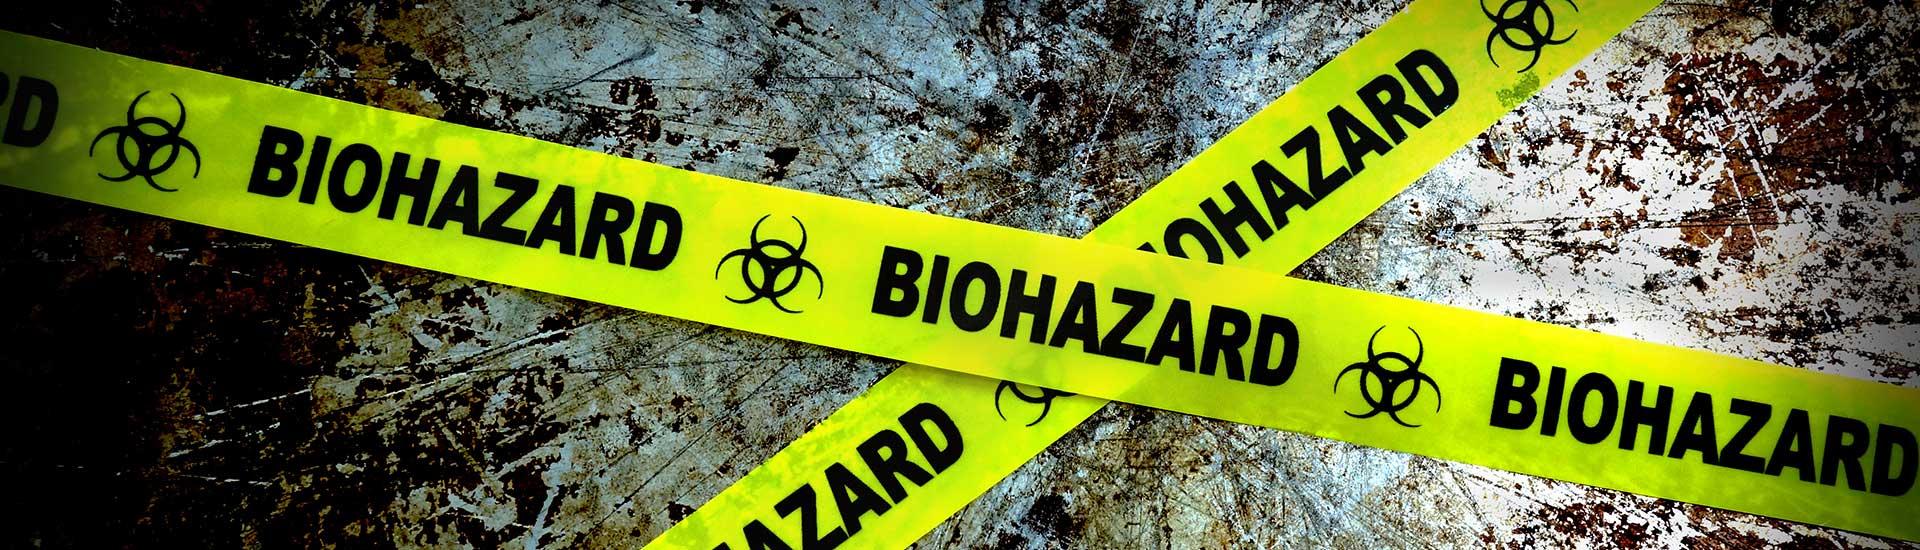 Biohazard Cleanup in Boynton Beach, Fort Lauderdale, West Palm Beach